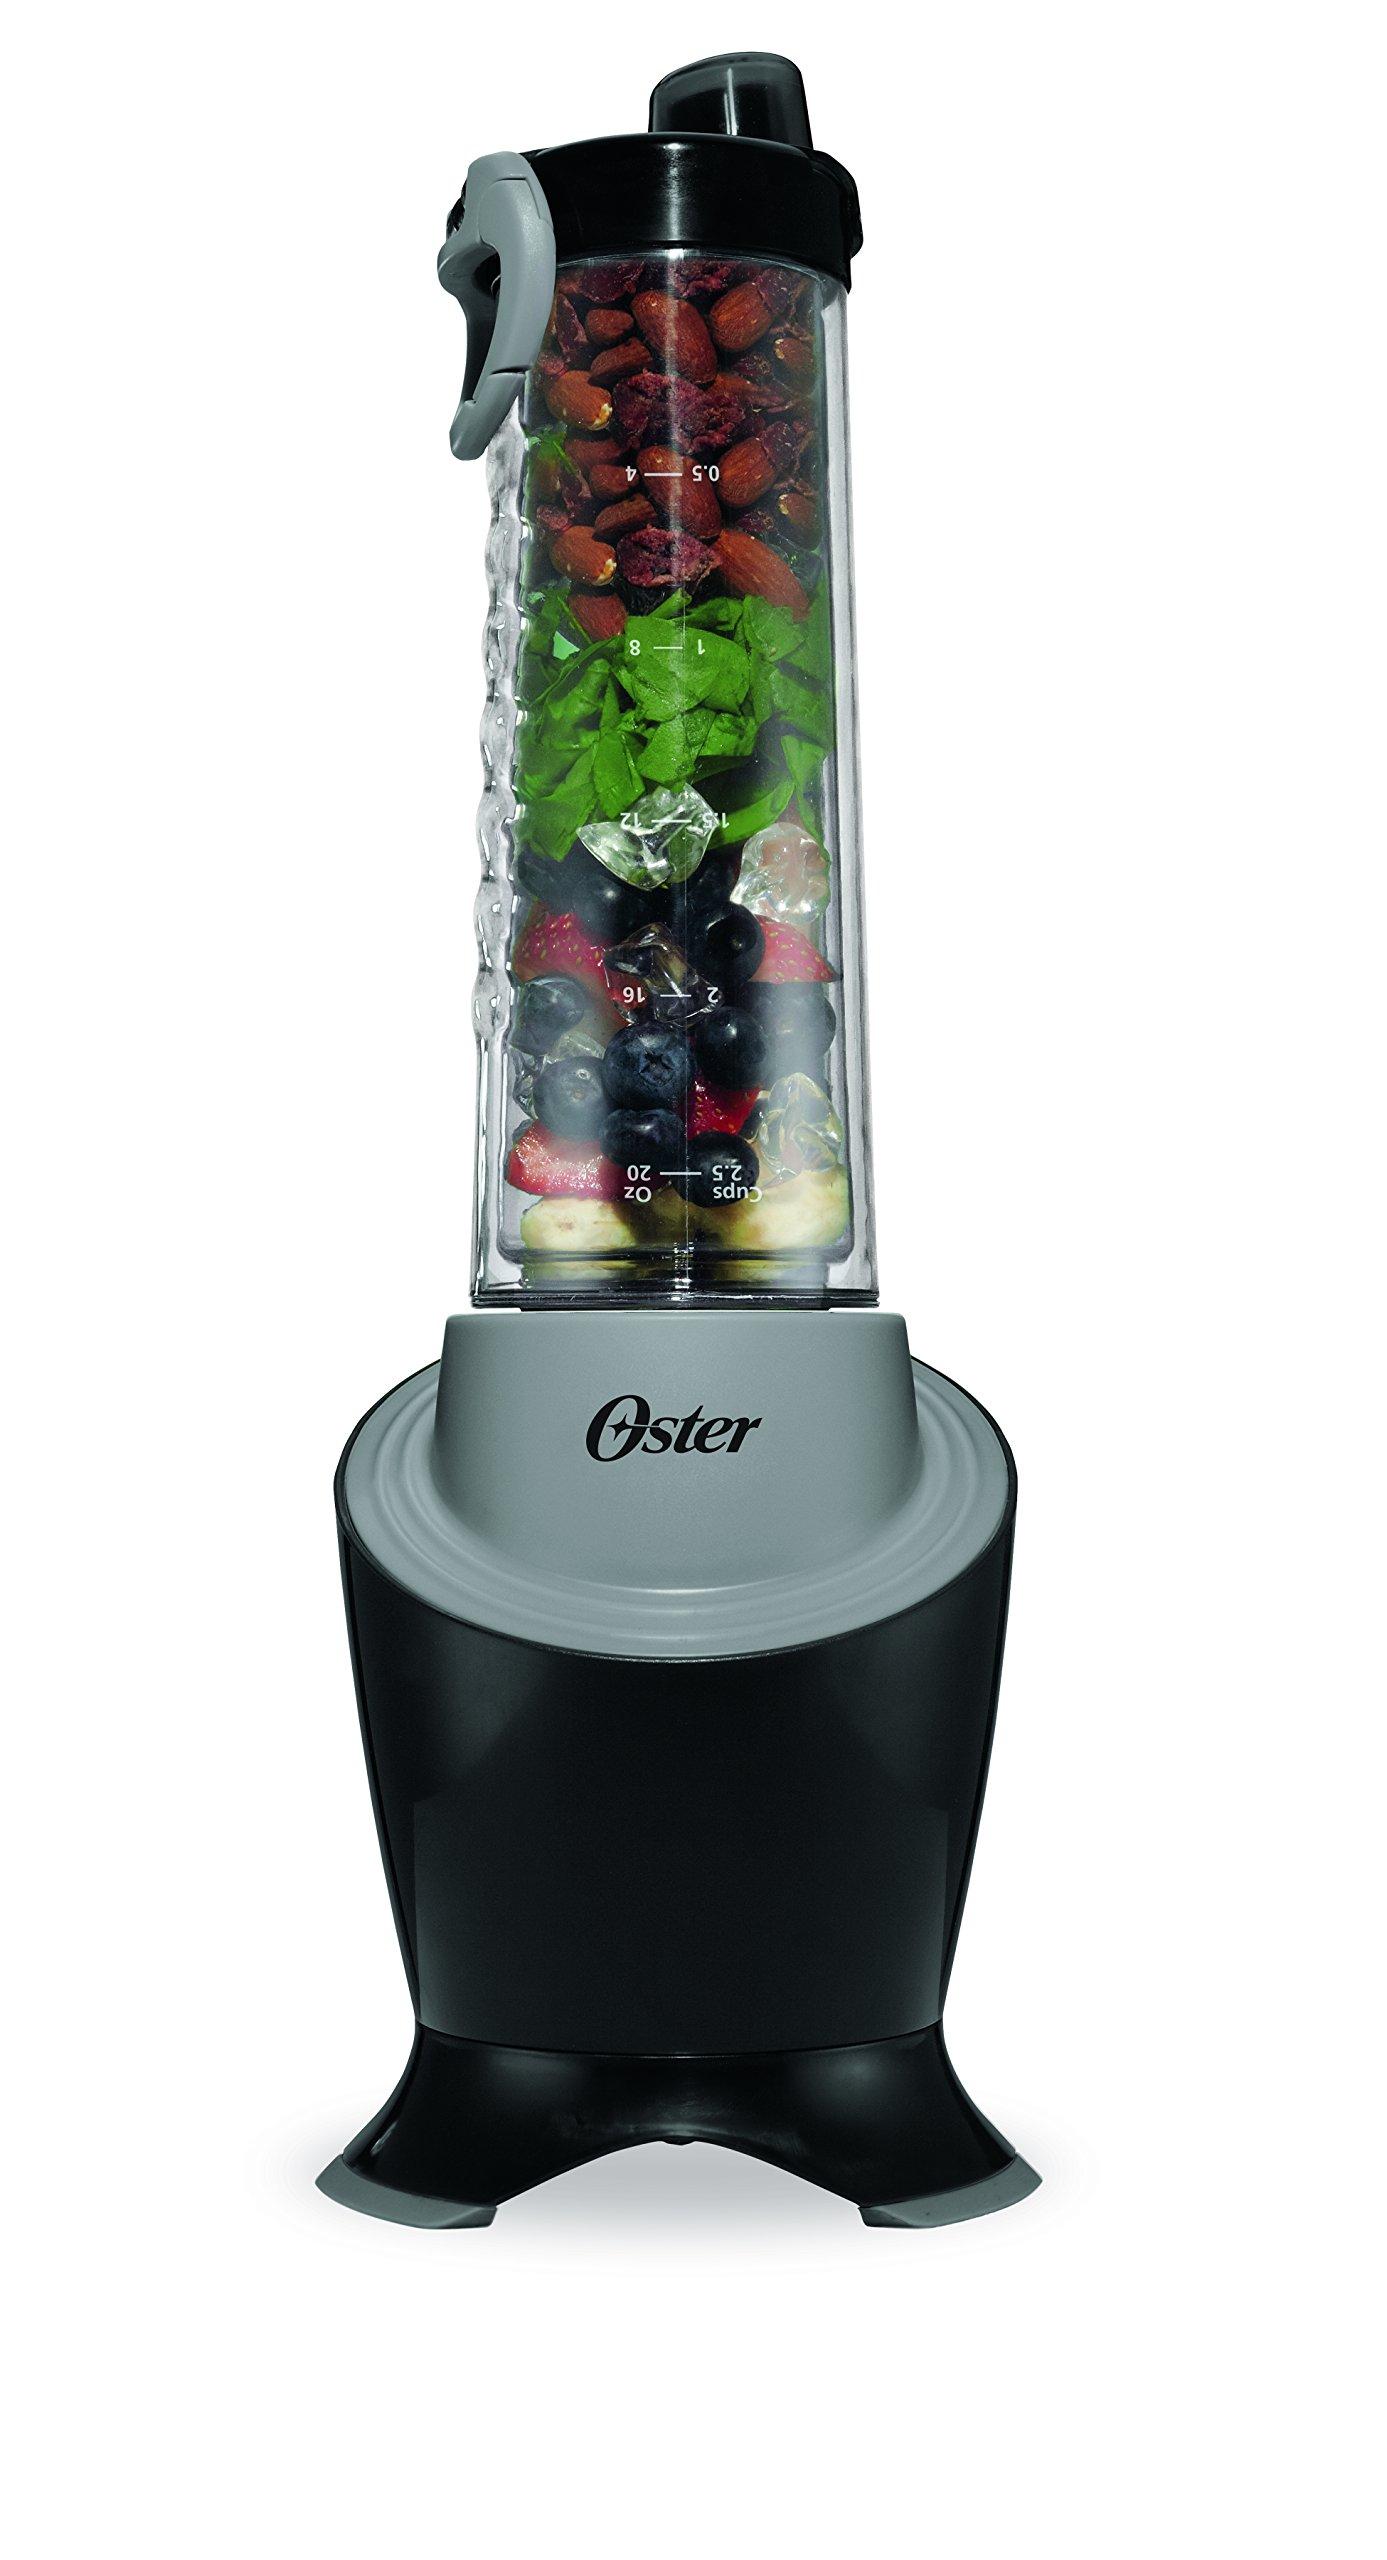 Oster MyBlend Pro Series Personal Blender with Condensation Free Bottle, Travel Clip and 4 Reusable Straws, Black/Grey, BLSTPB2-BGR